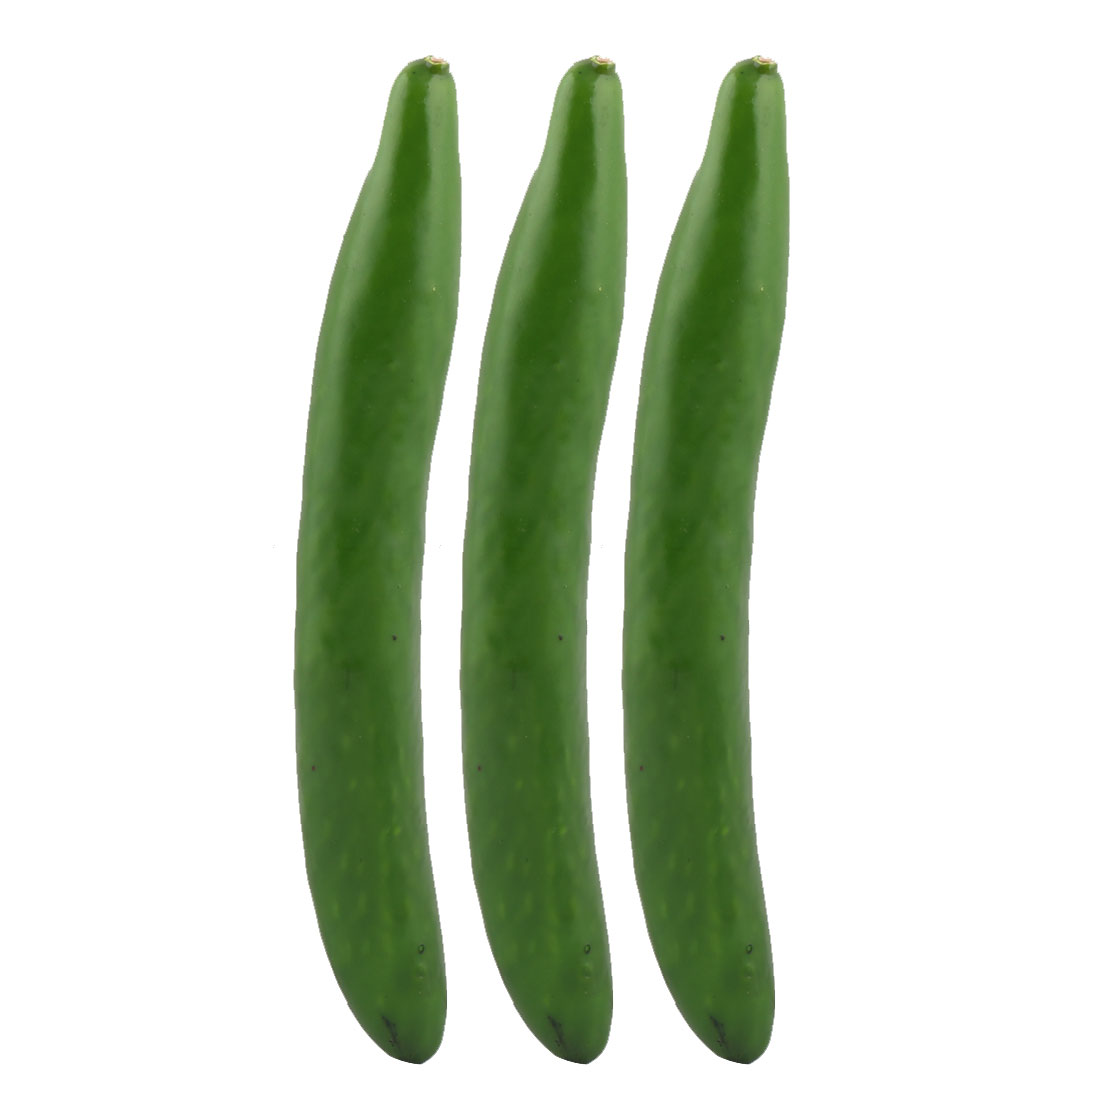 Photo Prop Decor Handmade Artificial Cucumber Design Vegetable Mold Green 3pcs